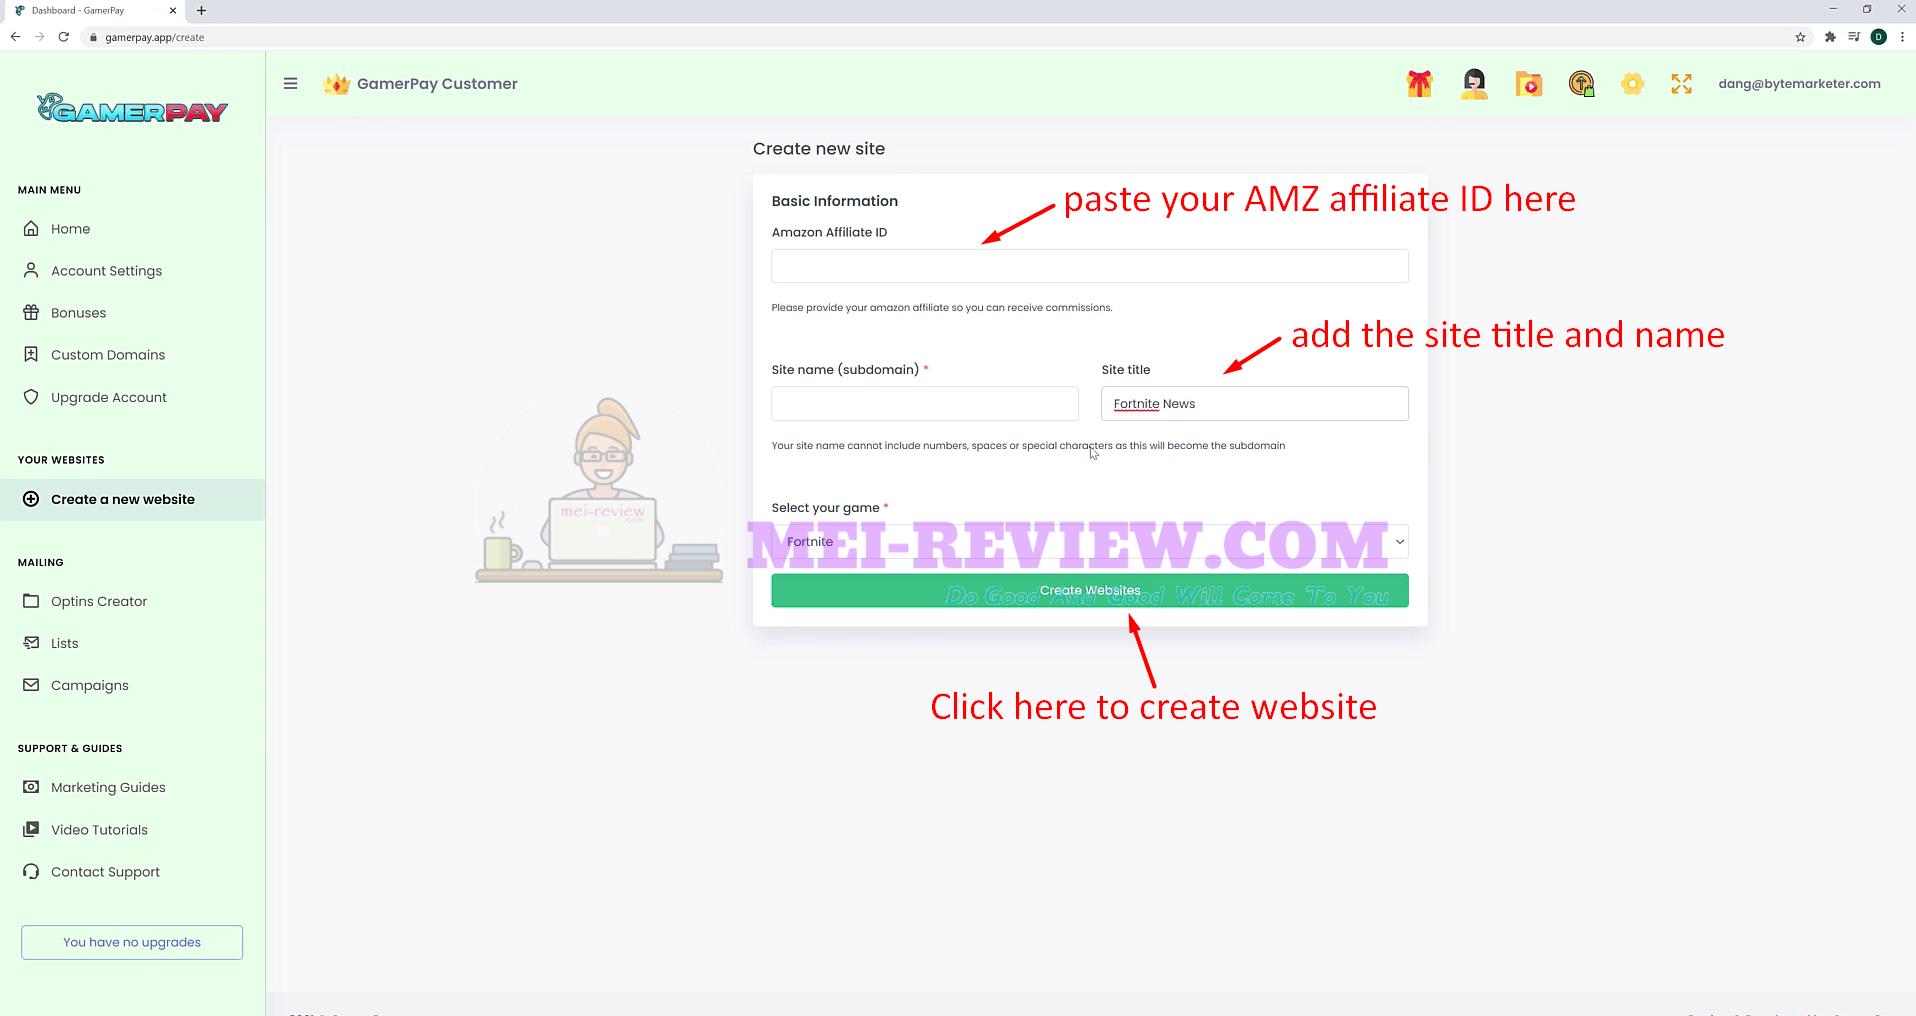 Gamerpay-Demo-4-ready-website